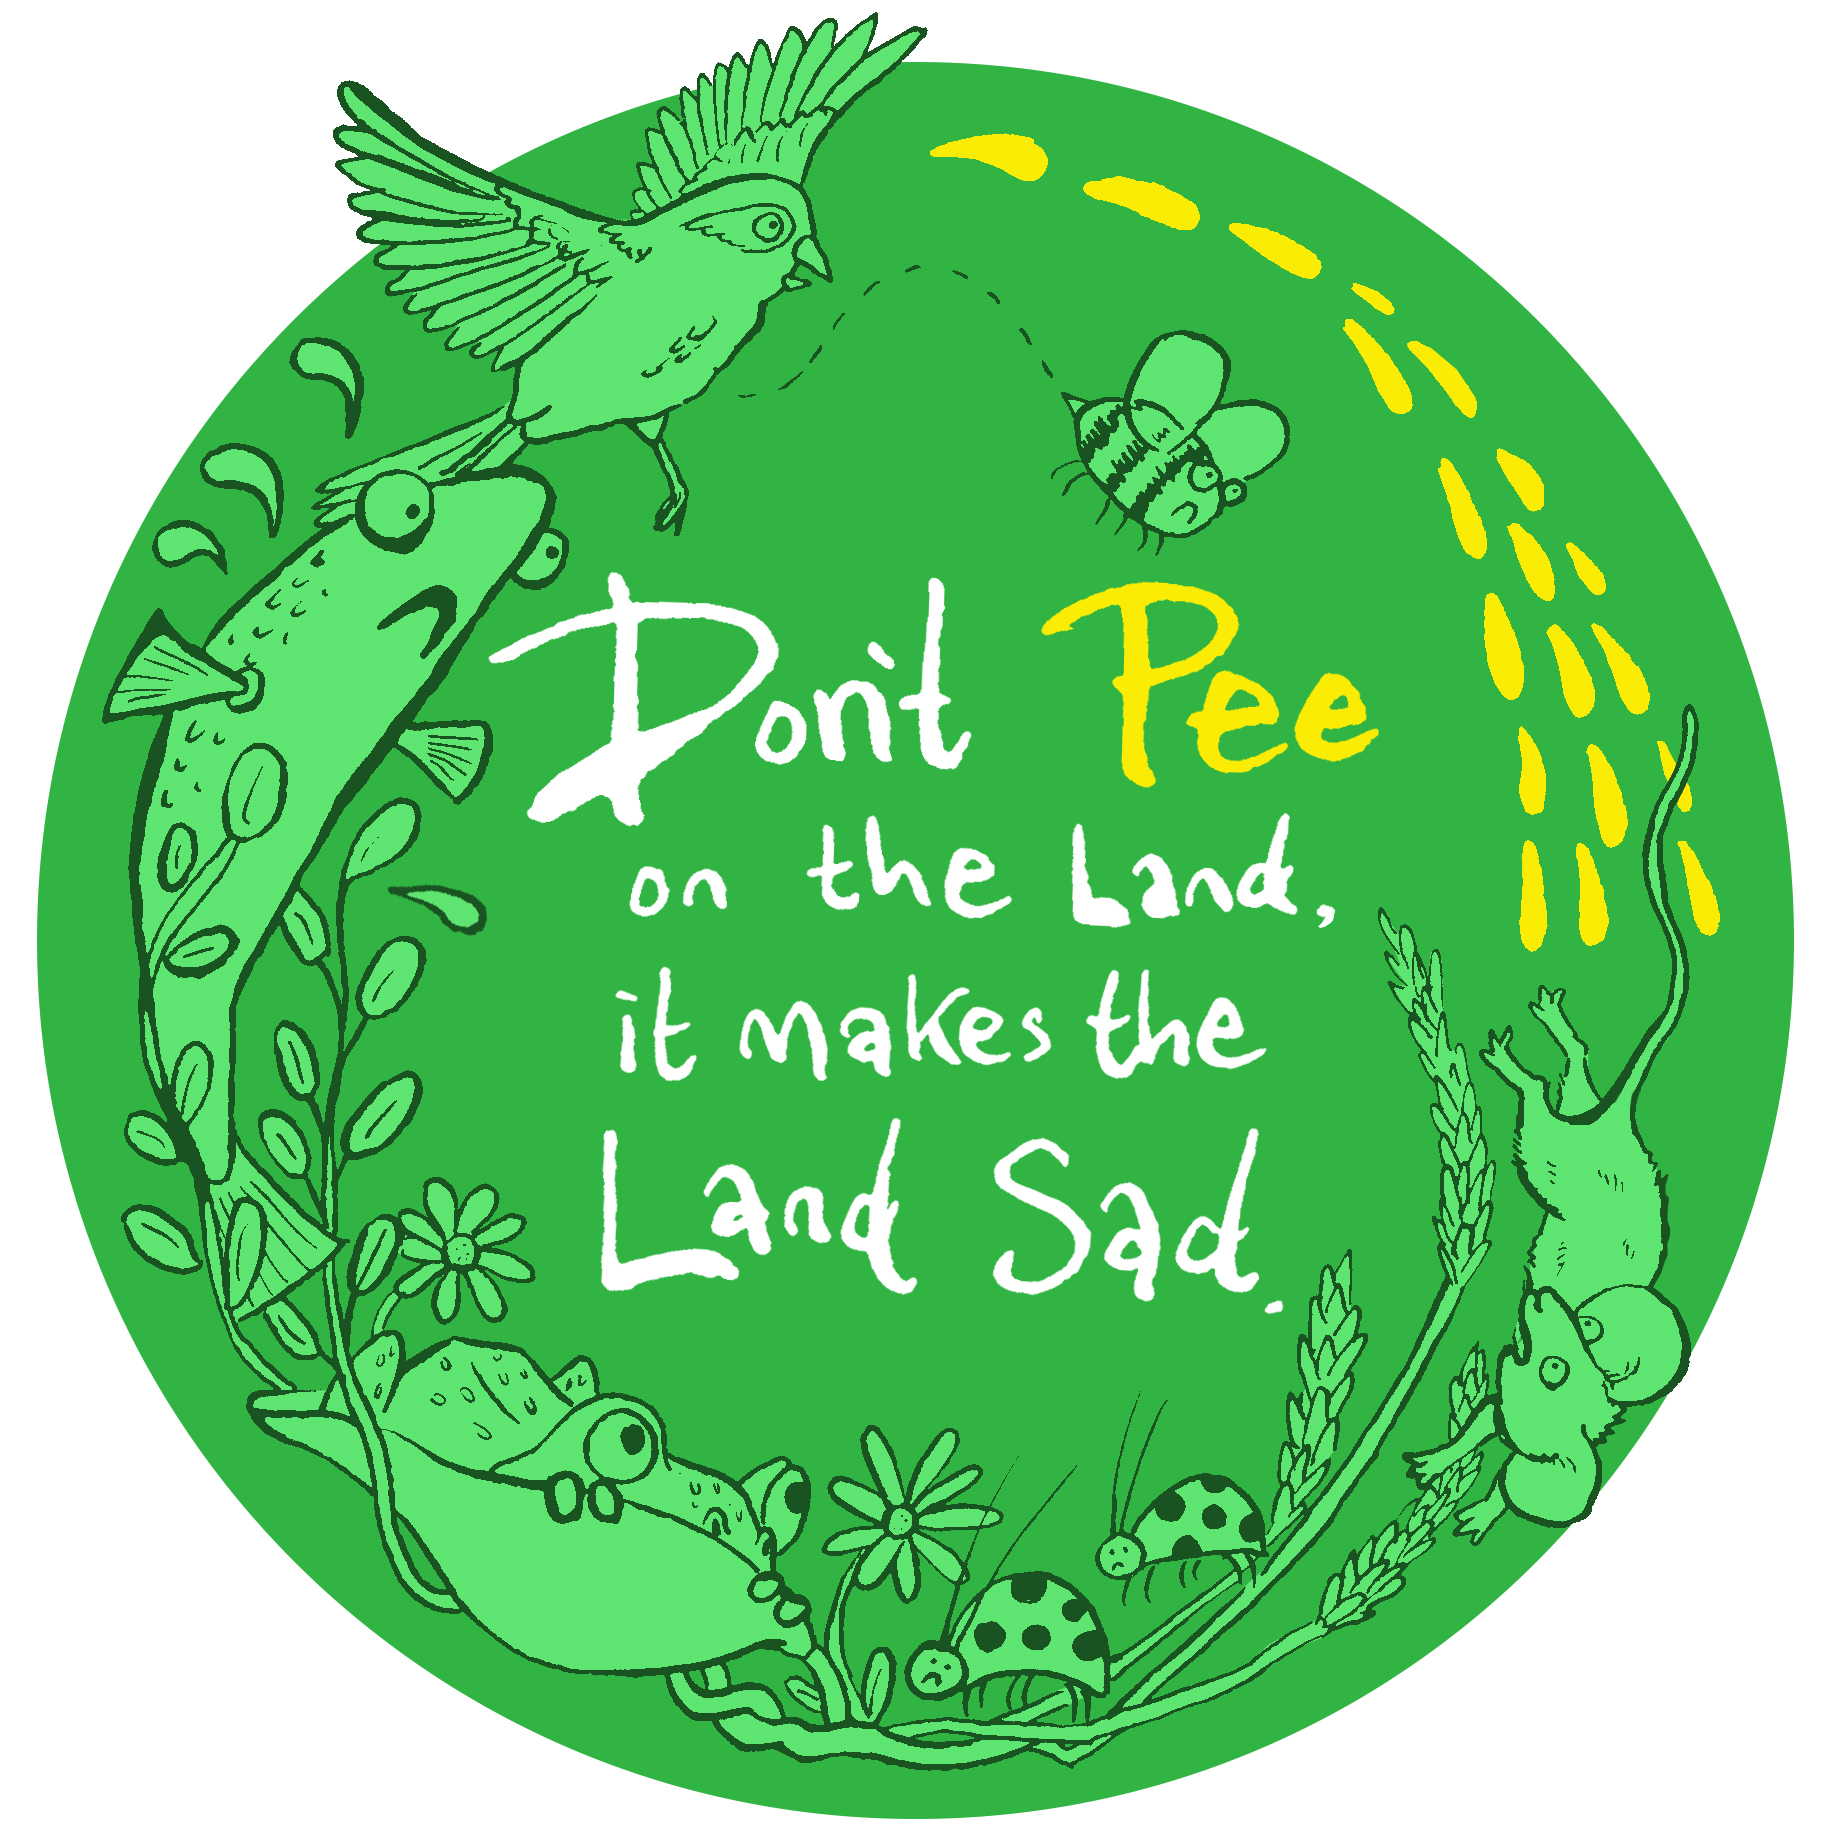 Glastonbury 'Don't Pee' logo